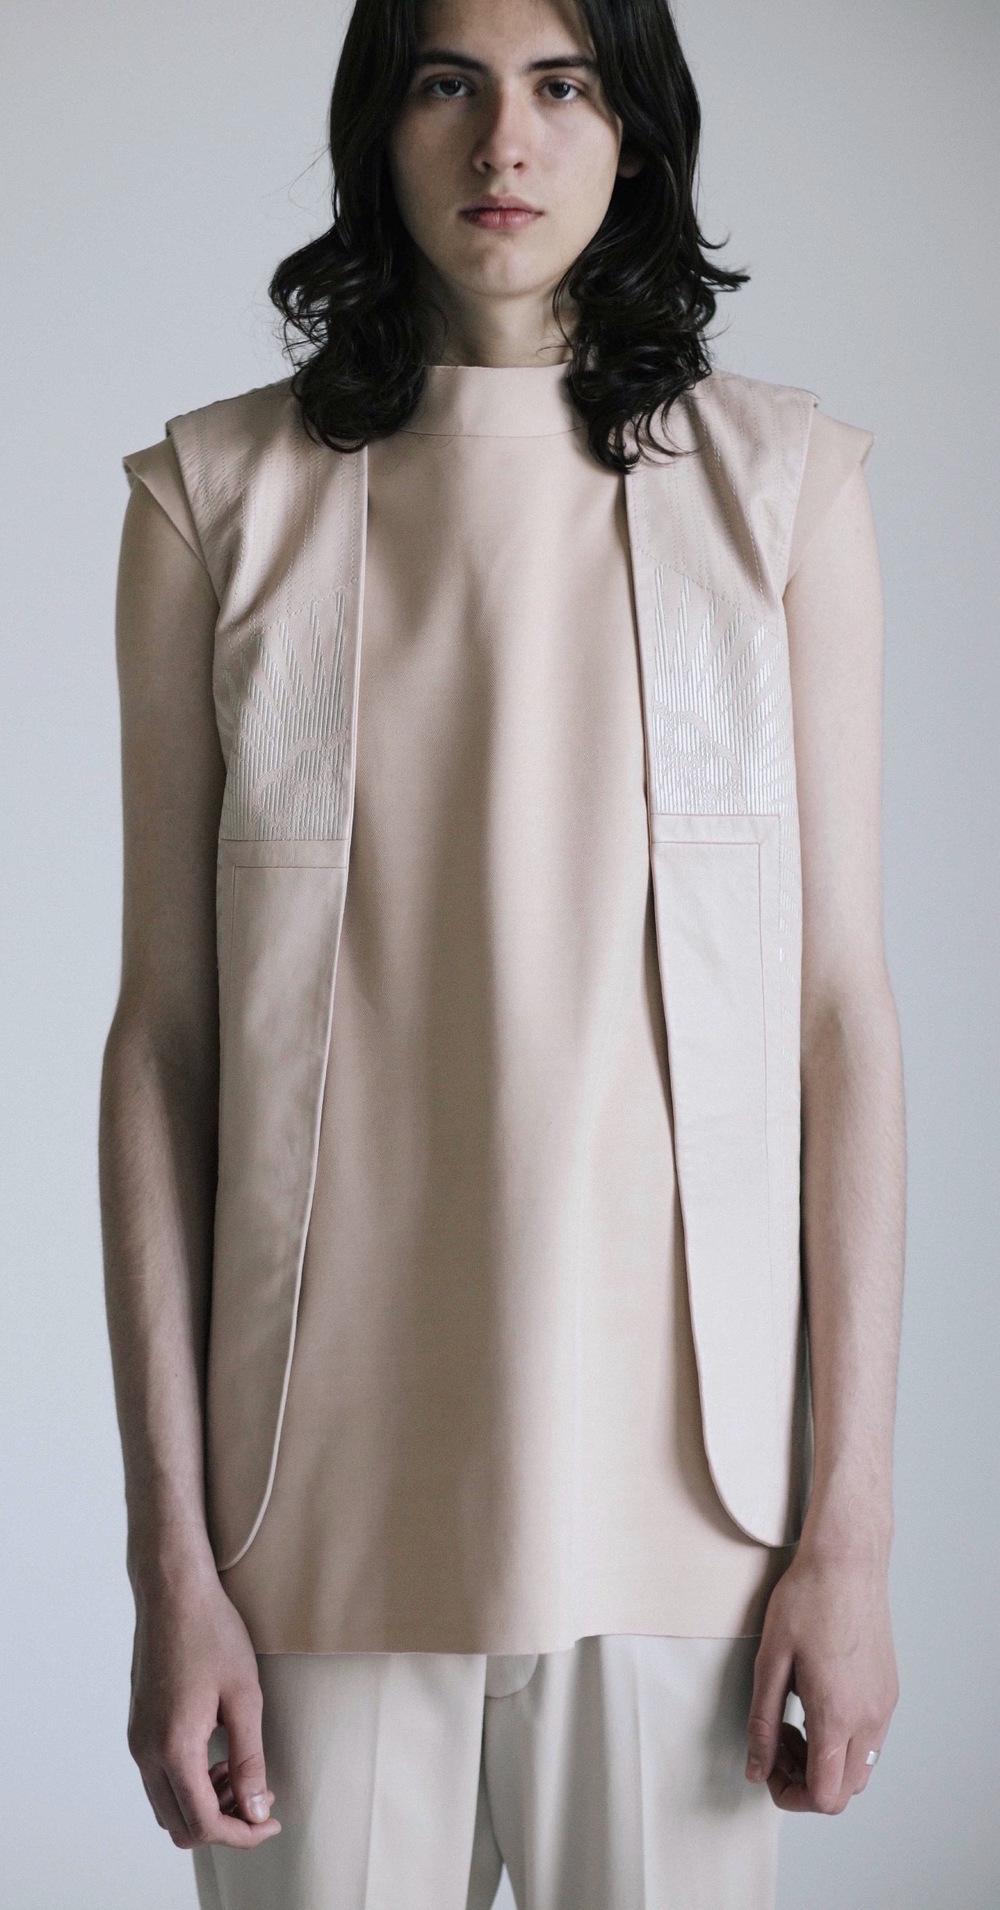 sleeveless-top-with-slits-on-the-sides-anna-kim-agoraphobia-collective